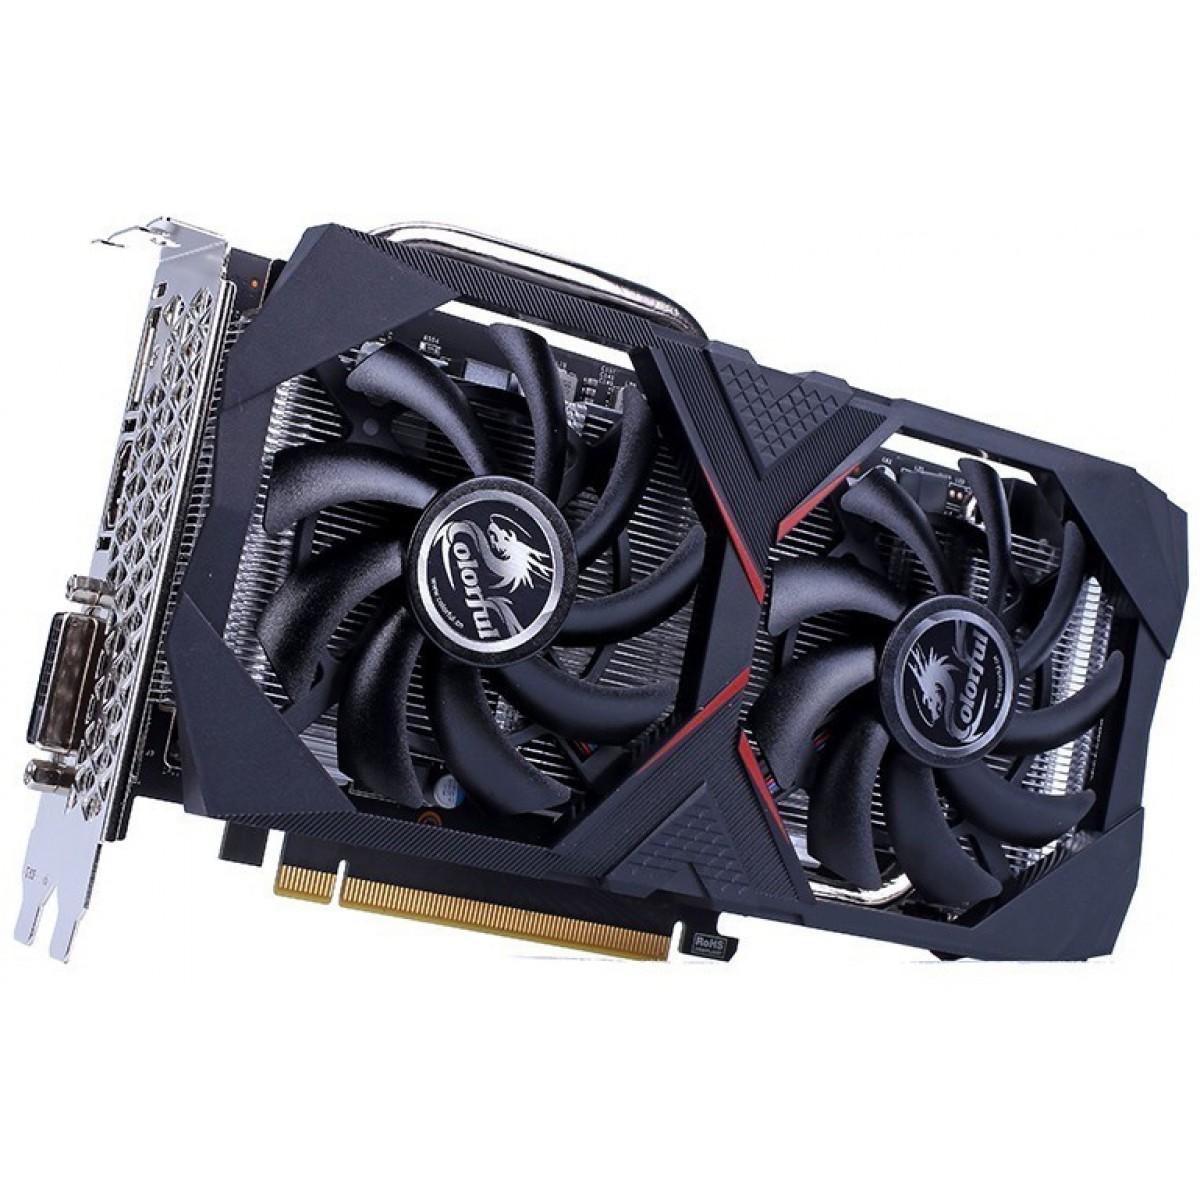 Placa de Vídeo Colorful GeForce GTX 1660 Super 6G-V, 6GB GDDR6, 192Bit